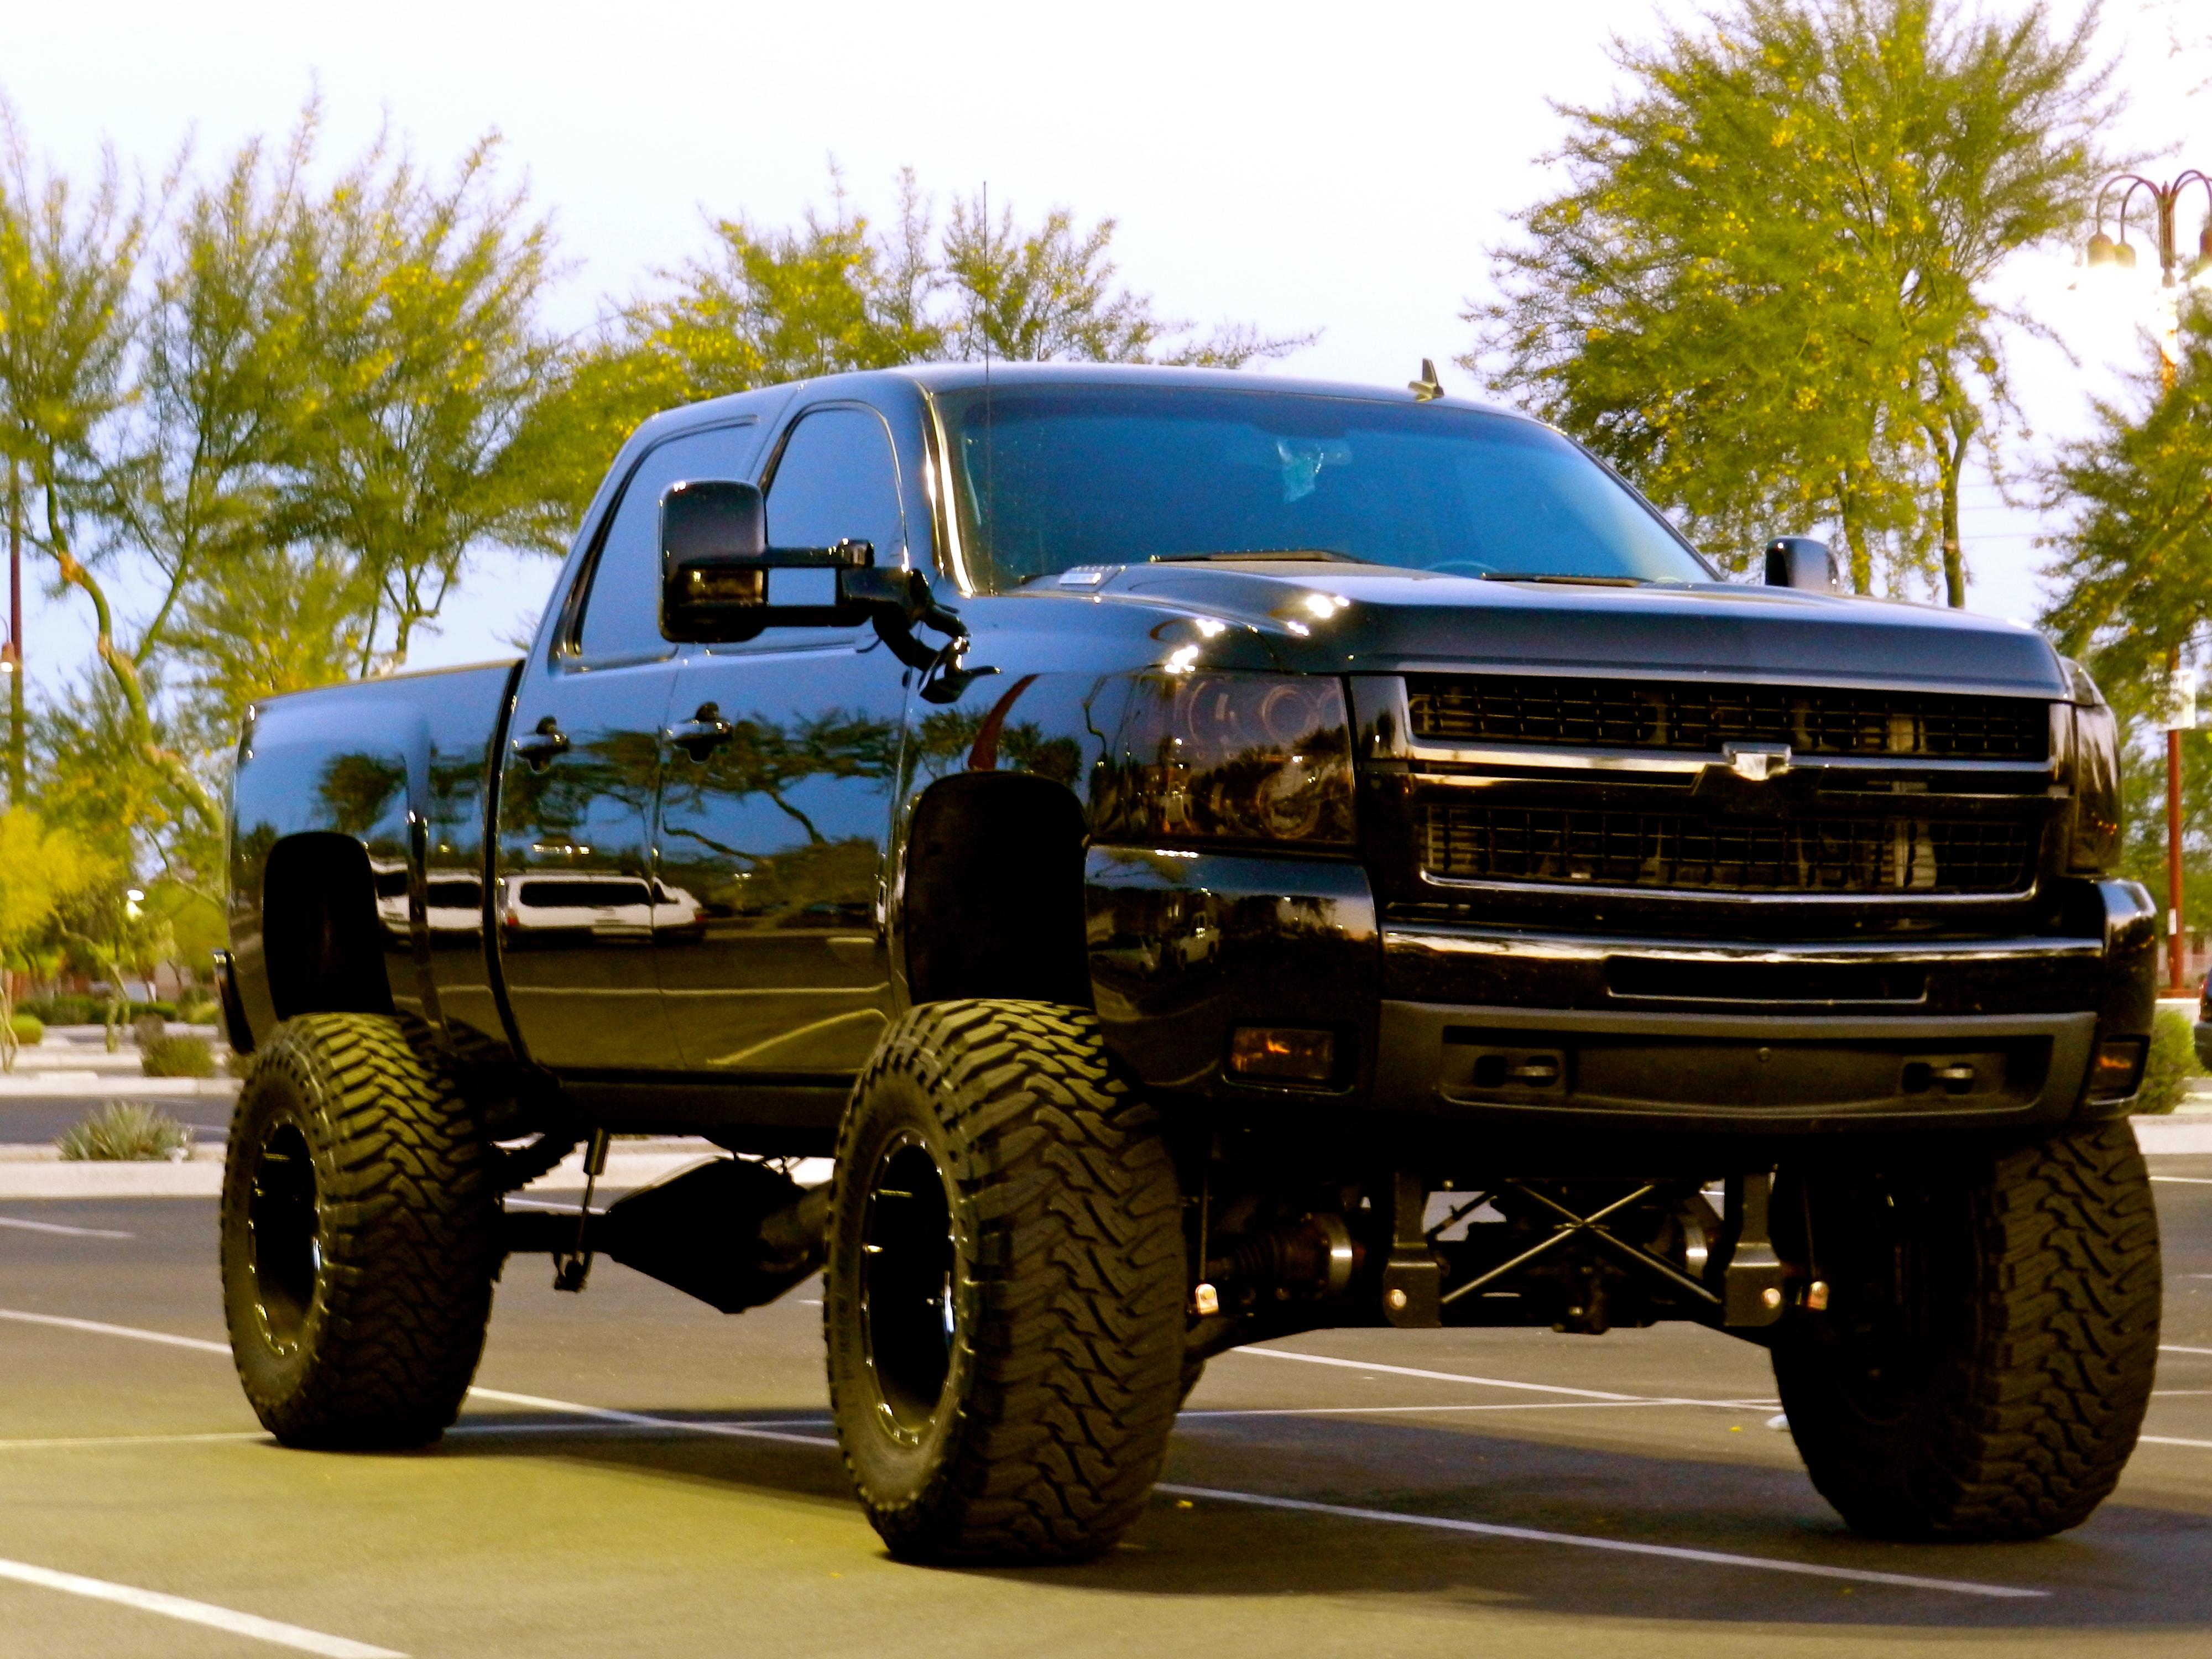 Lifted Chevy Lifted Chevy Trucks Black Dragon 075 2500HD 4000x3000